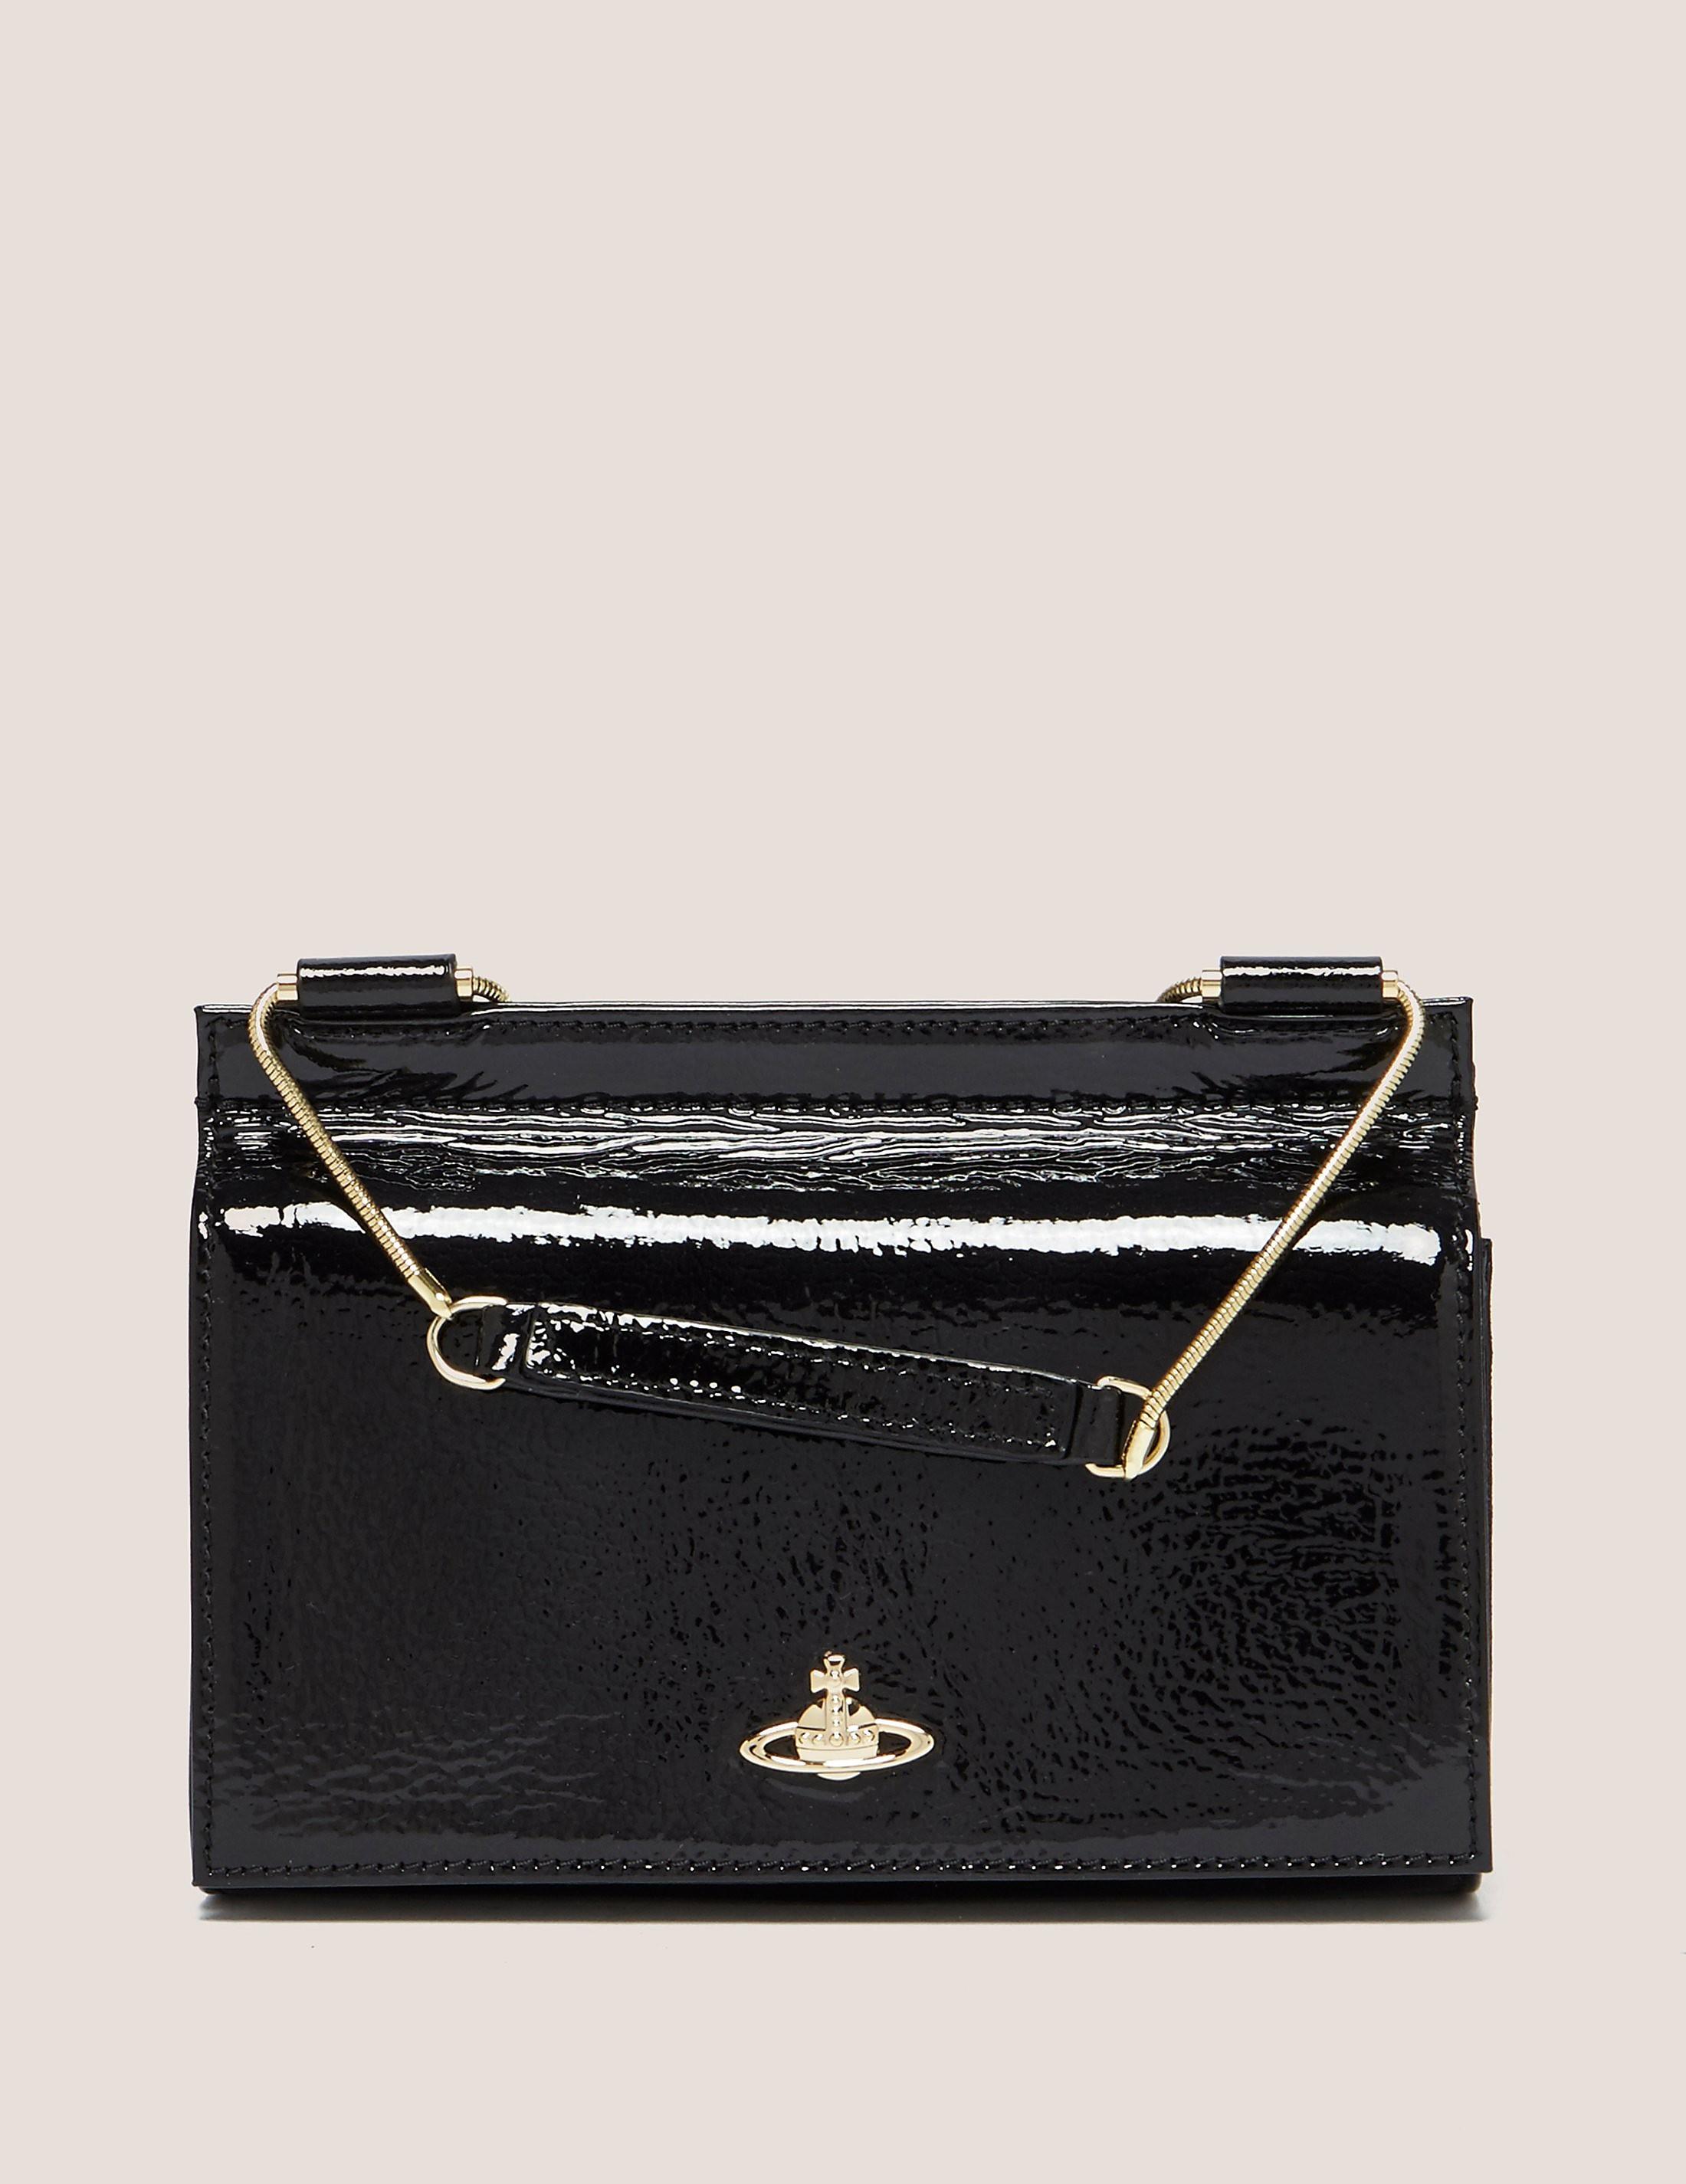 Vivienne Westwood Margate Small Crossbody Bag - Online Exclusive